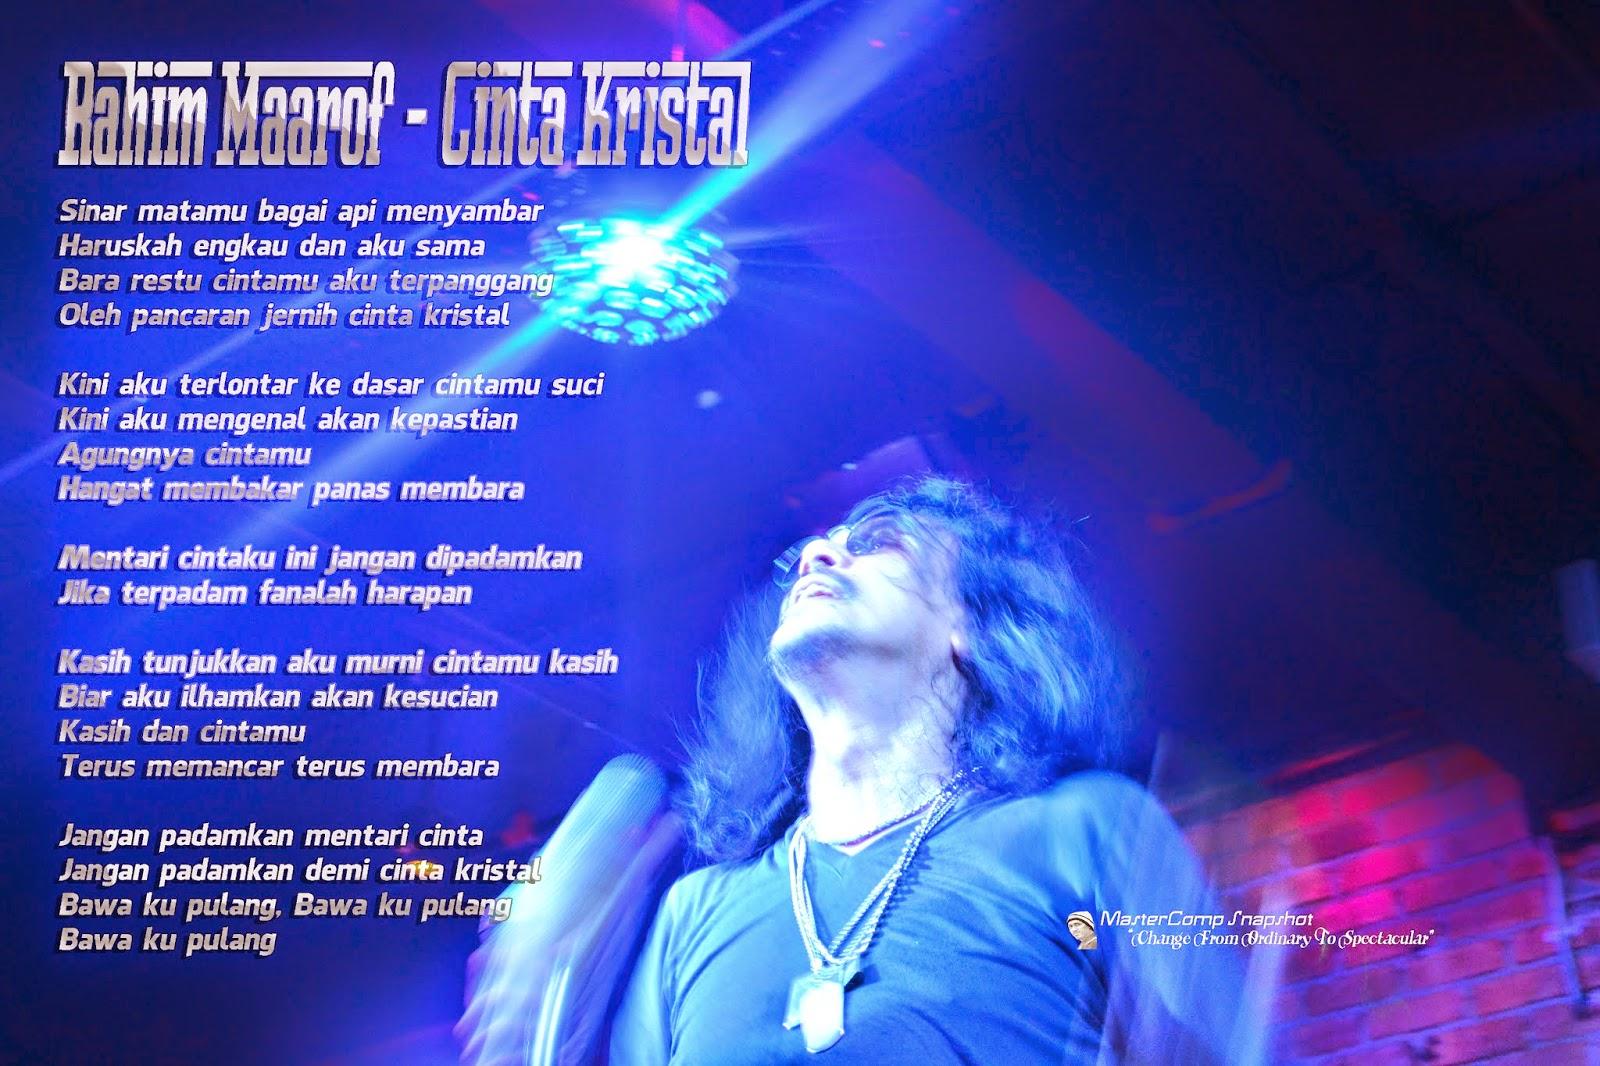 Lirik Rahim Maarof - Cinta kristal